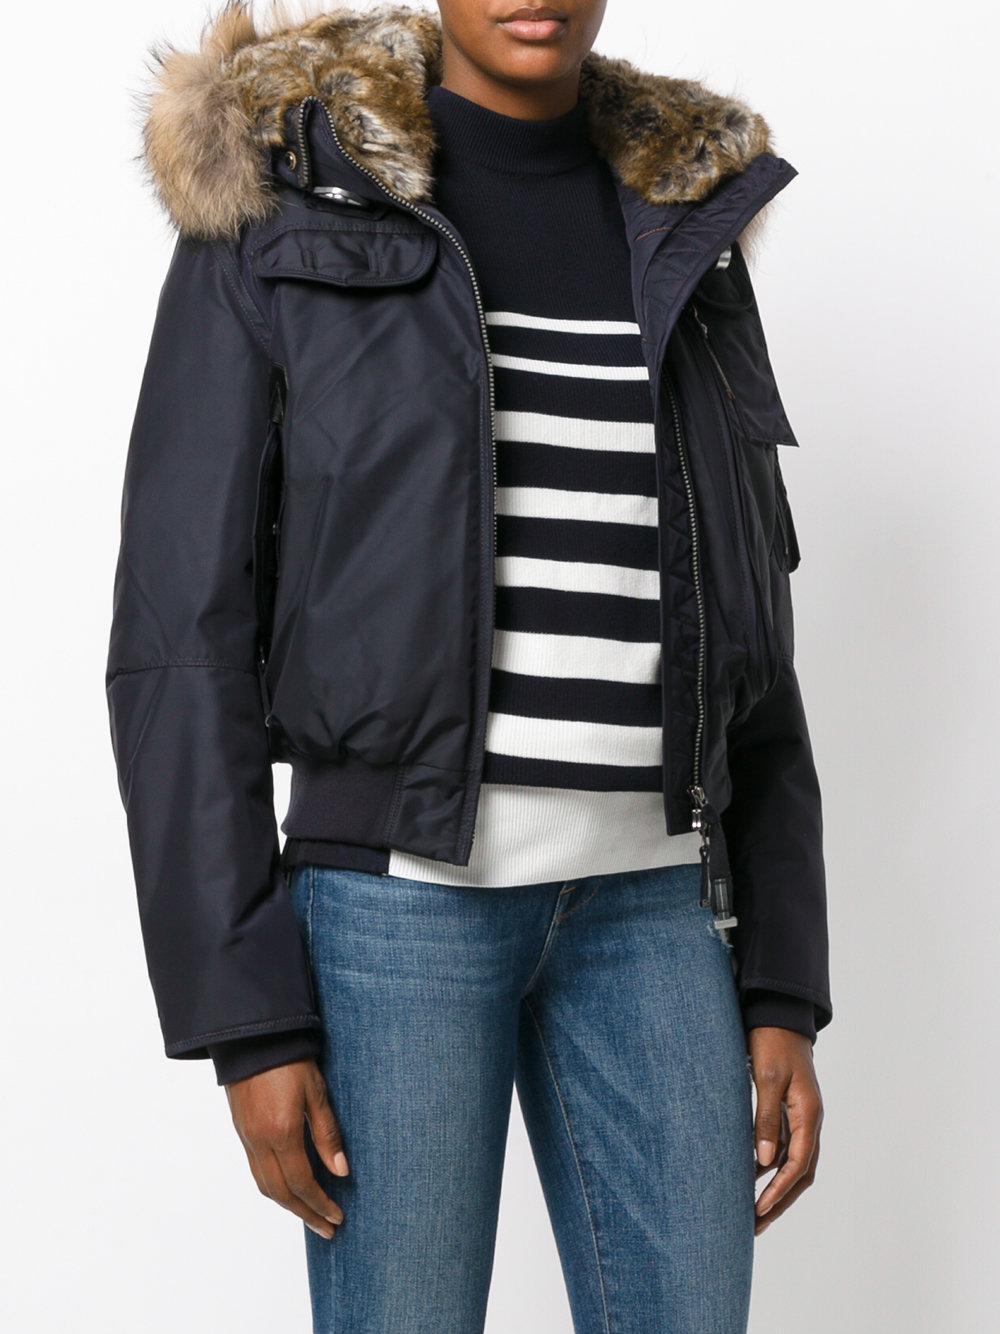 PARAJUMPERS Cropped Jackets en línea